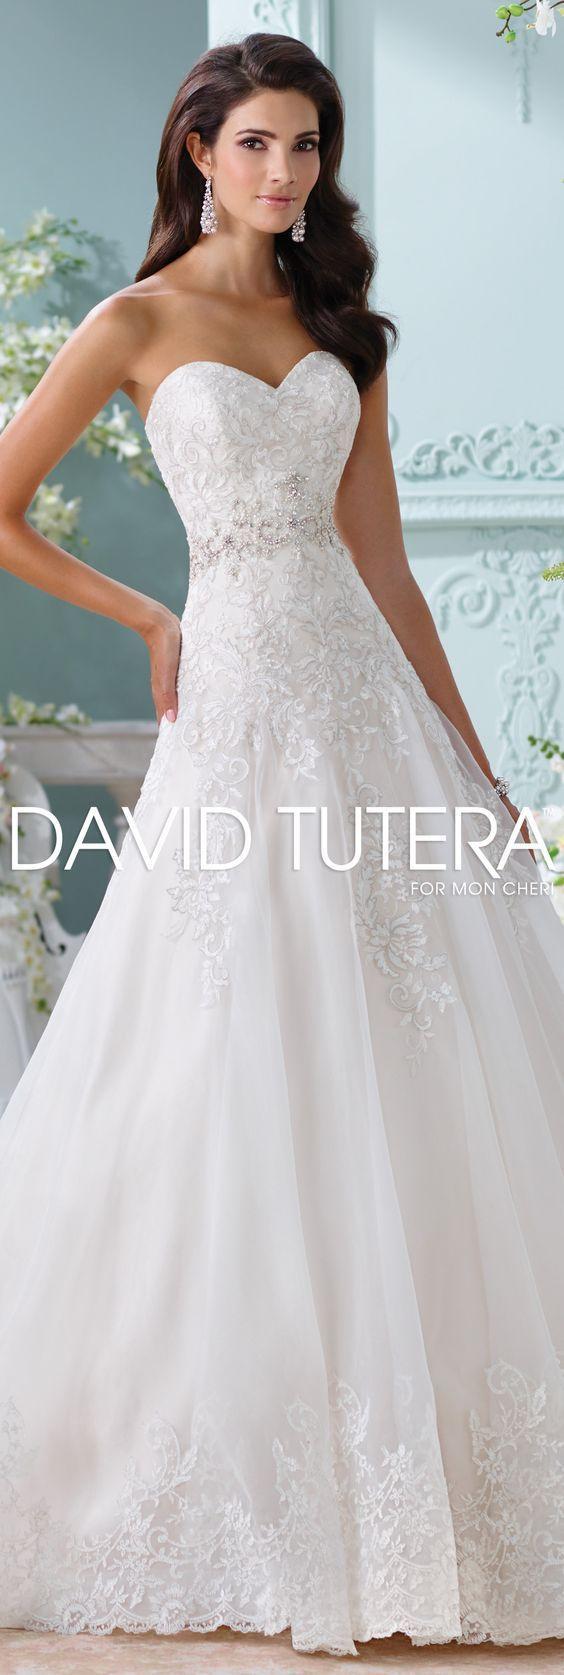 Gorgeous Wedding Dresses by David Tutera for Mon Cheri - #by #Cheri #David #Dresses #for #Gorgeous #Mon #Tutera #Wedding